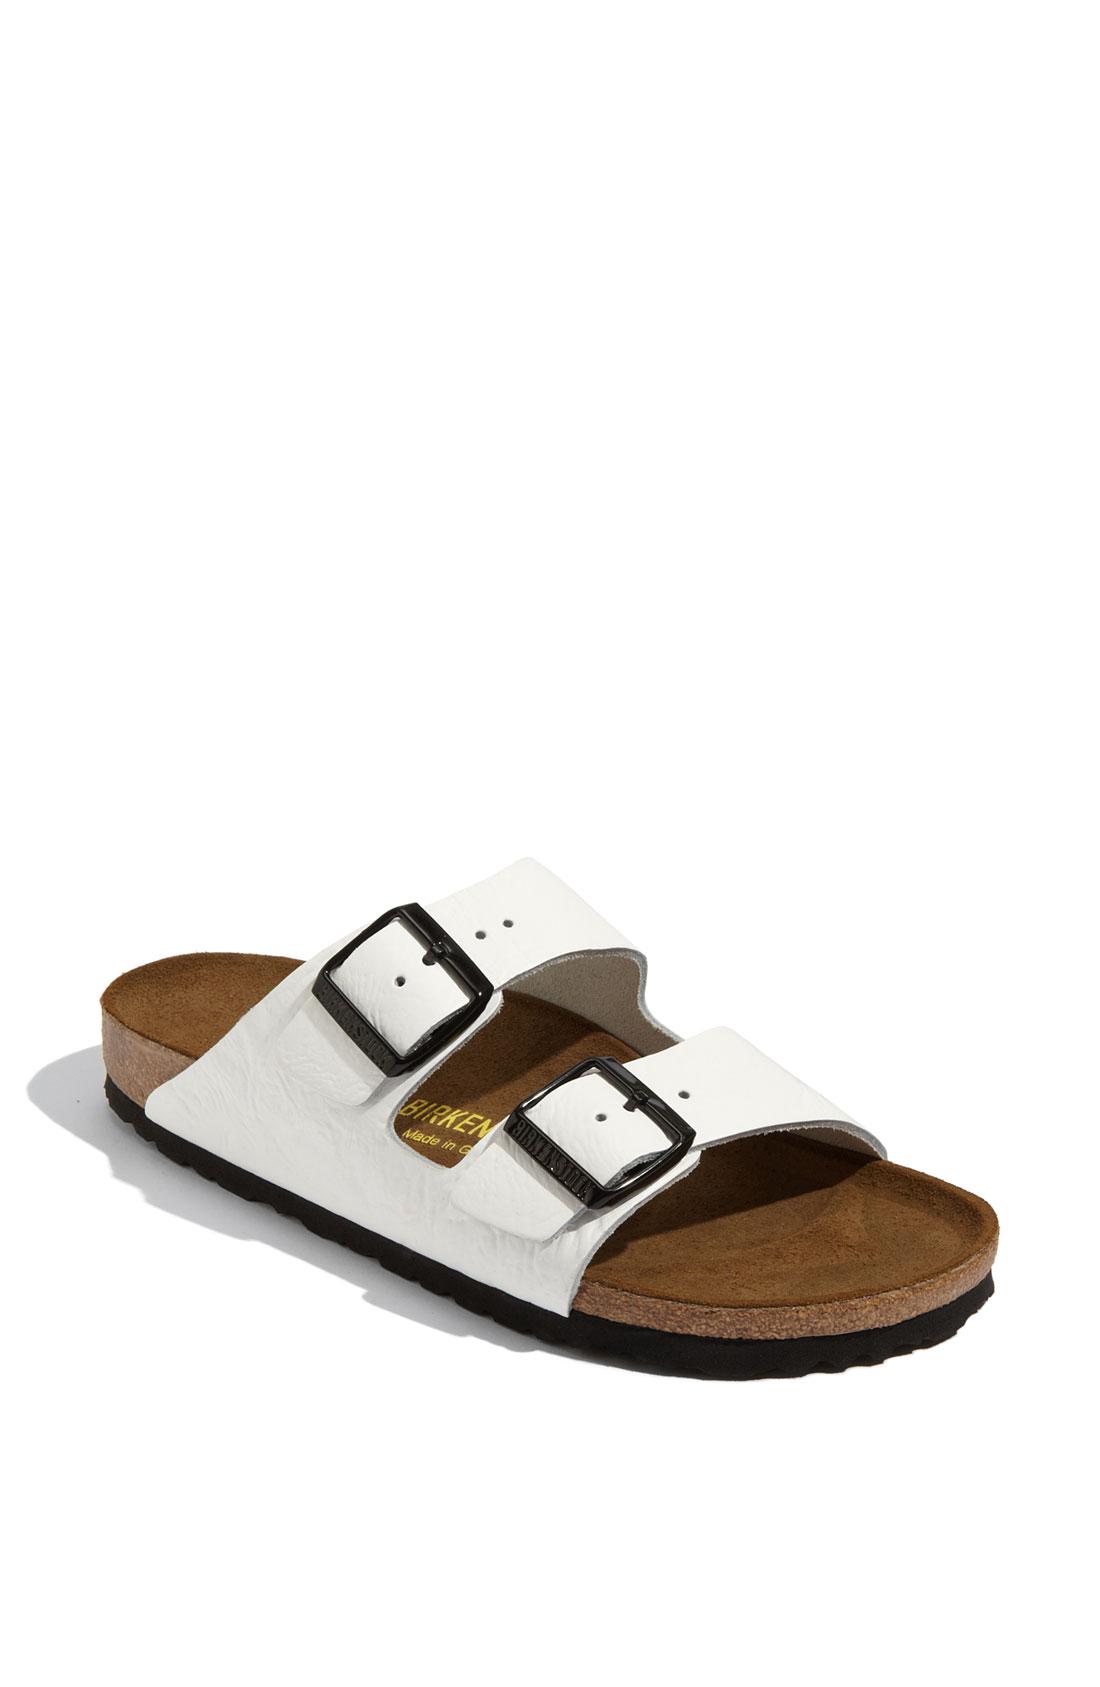 Unique  Womens  Birkenstock  Birkenstock Mayari Sandals White Patent